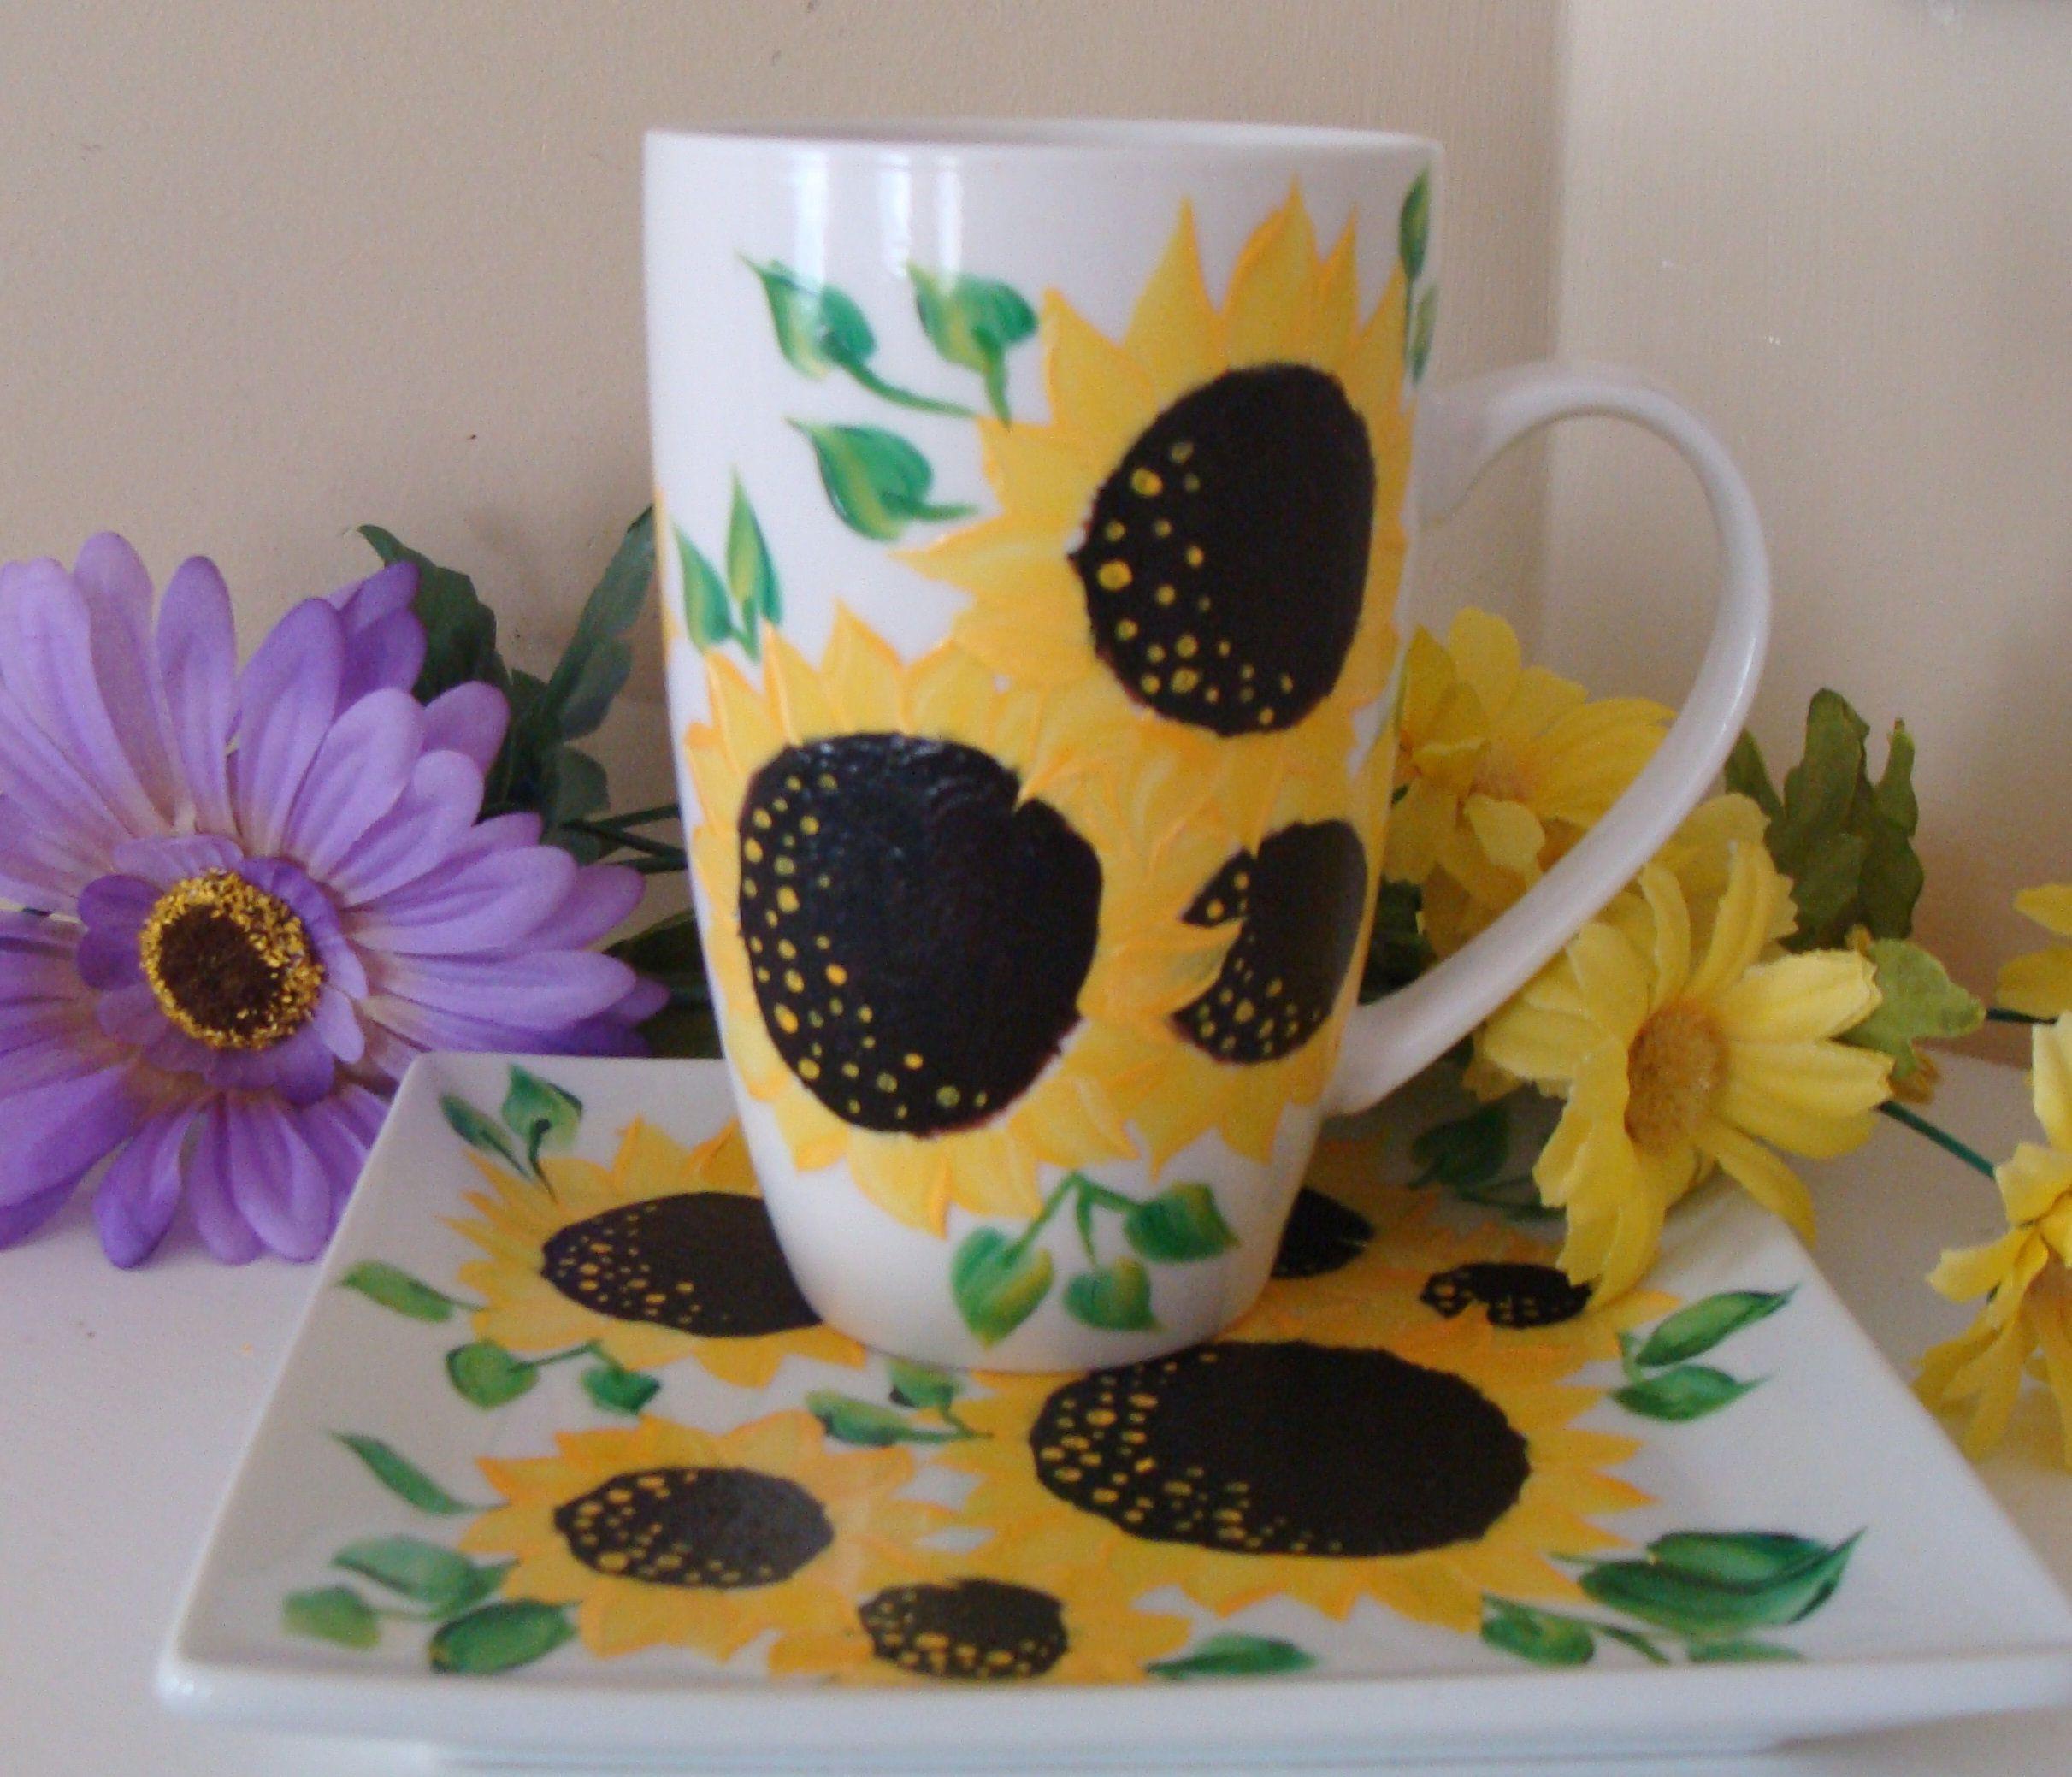 Sunflower Cup and Saucer Set, Sunflower Mug Plate, Autumn dish ware, Sunflower Kitchen Decor, Fall Decor, Floral, Thanksgiving Dinnerware